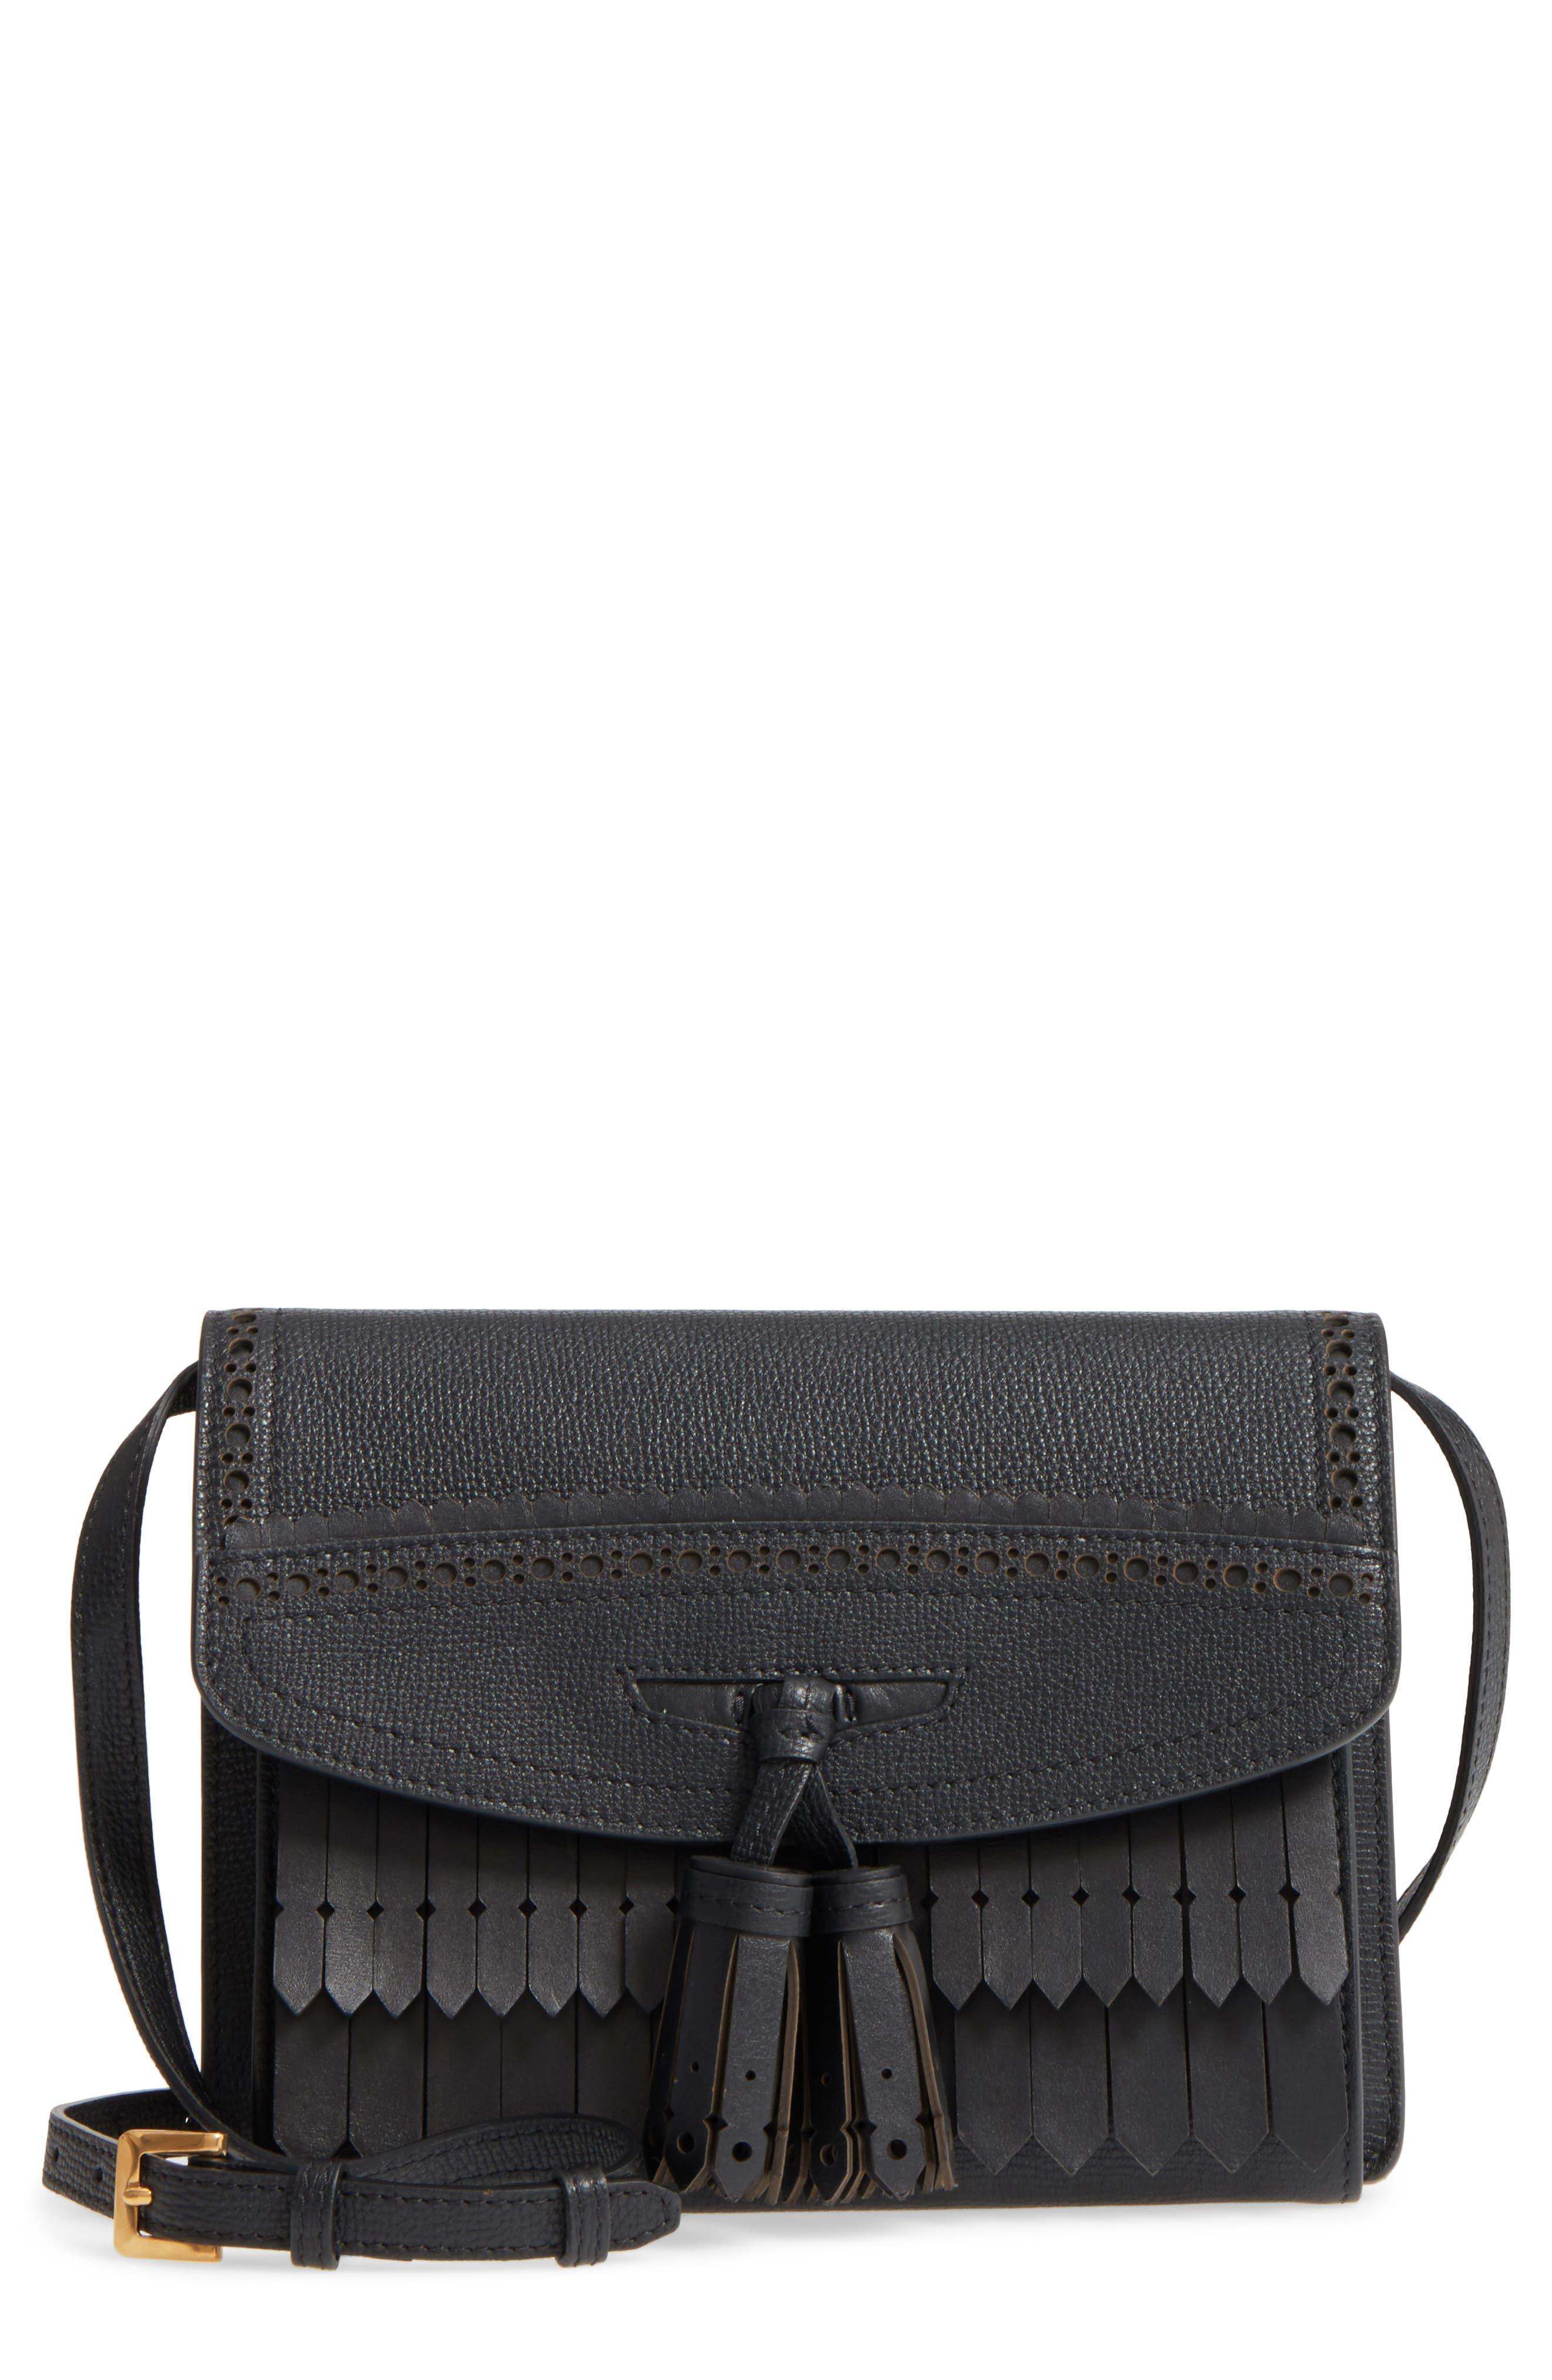 Macken Fringe Leather Crossbody Bag,                             Main thumbnail 1, color,                             Black